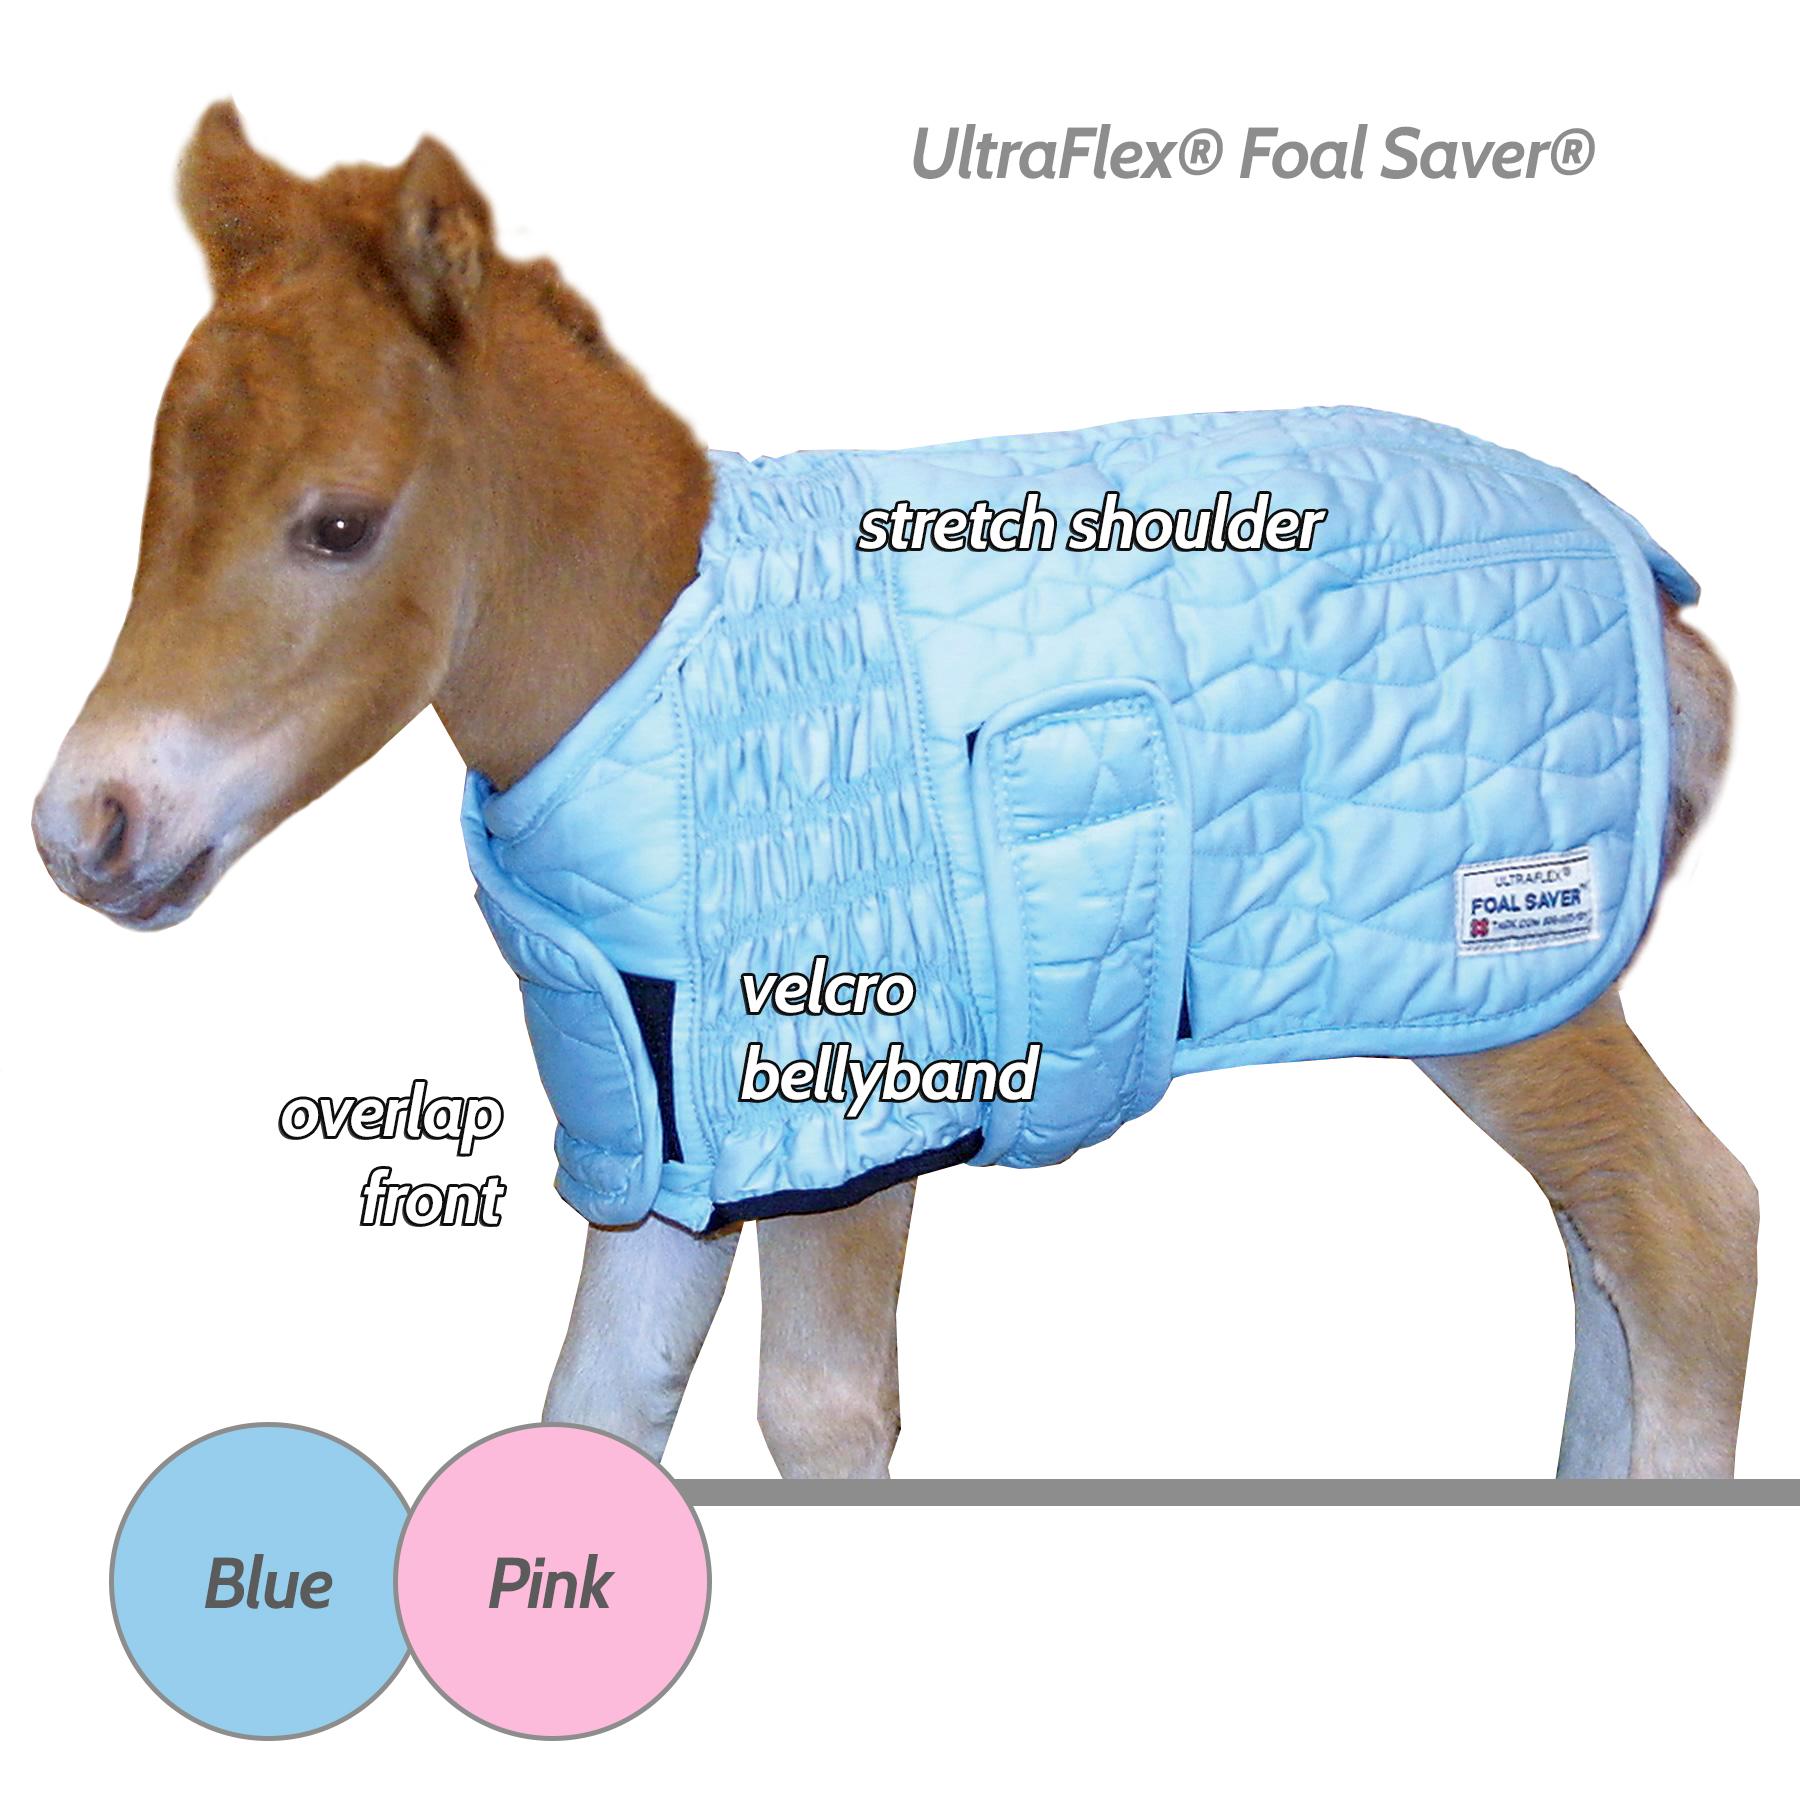 ai16012-UltraFlex®-Foal-Saver®